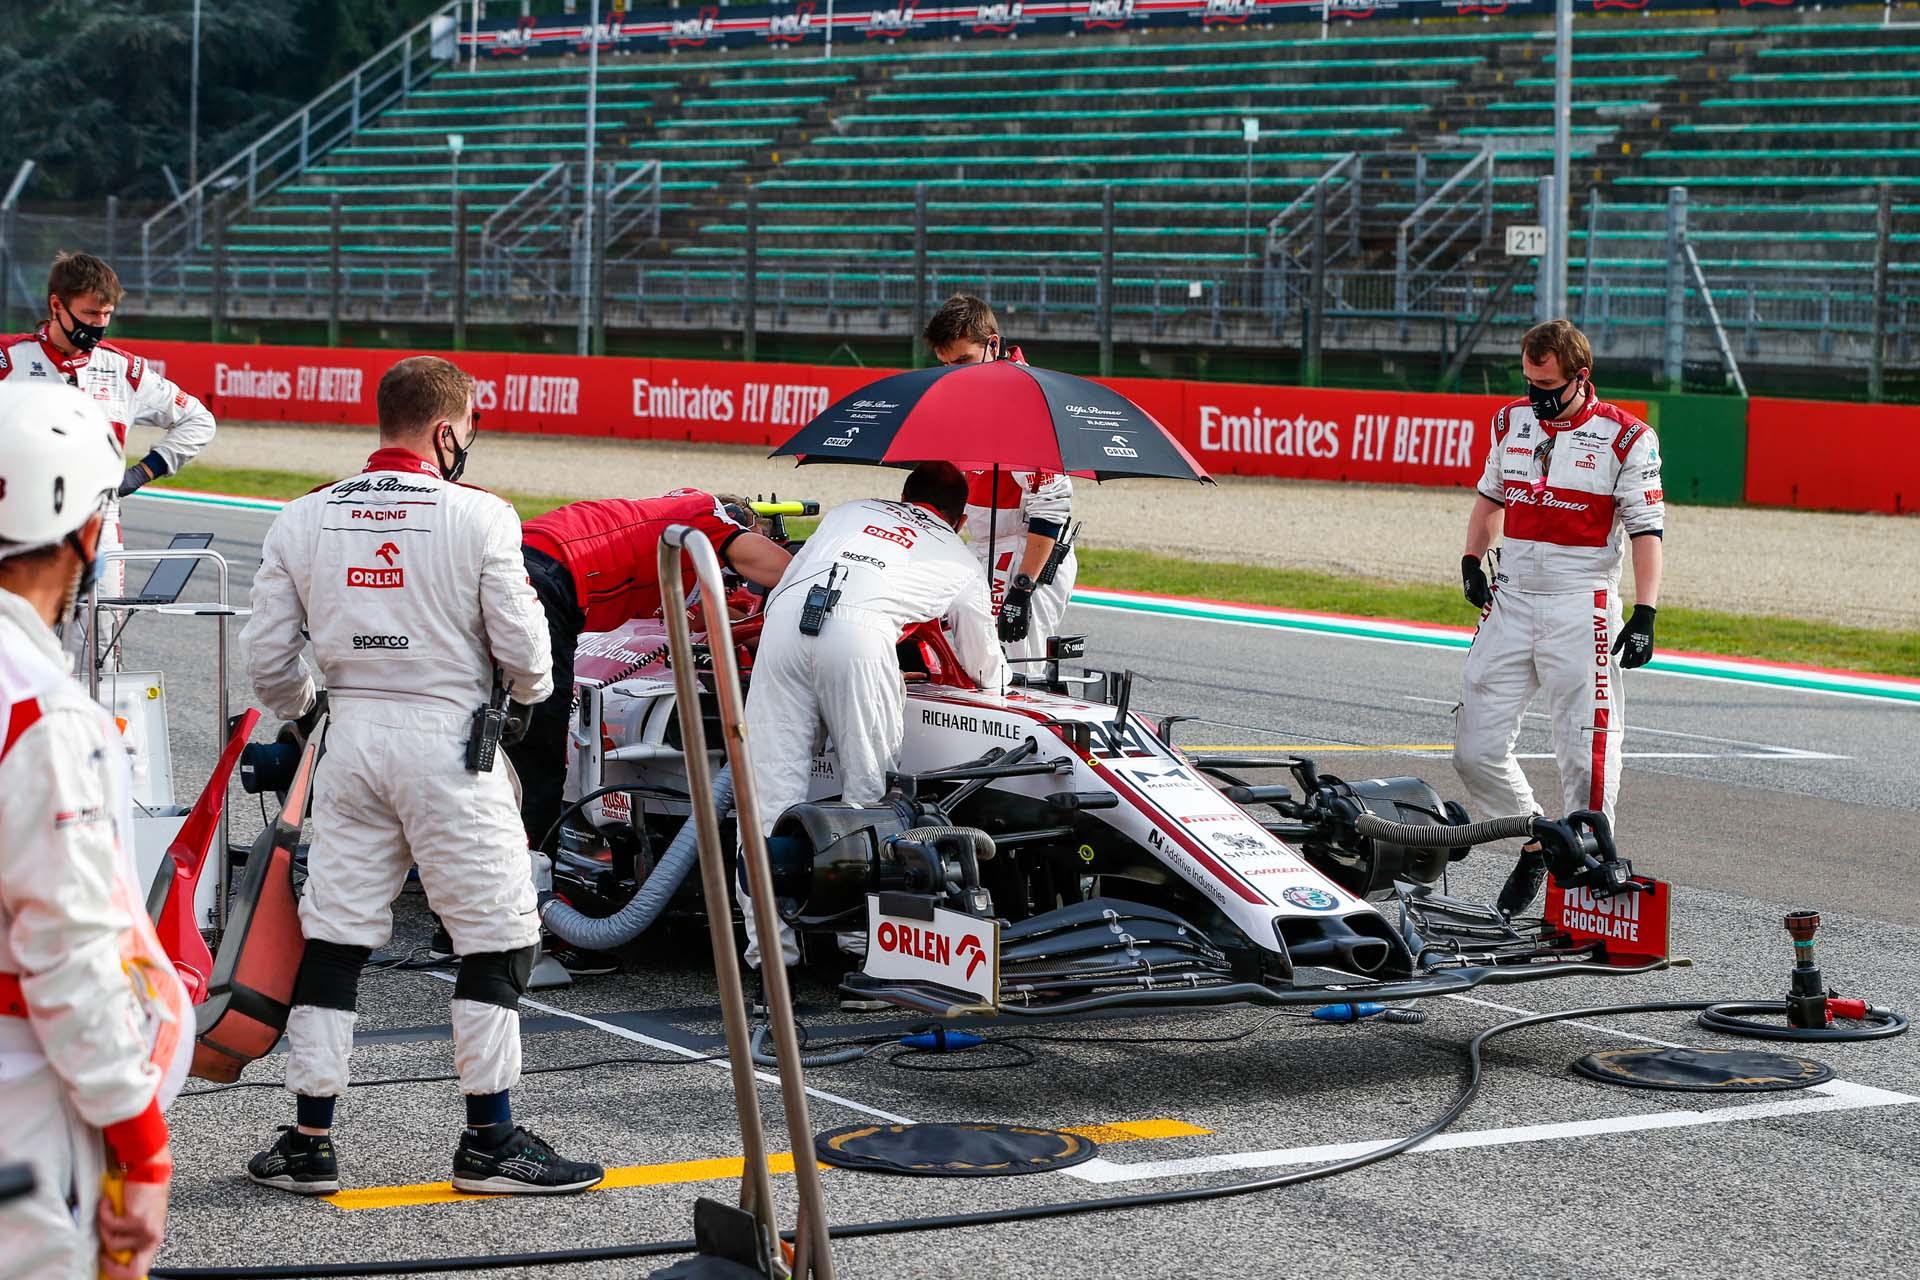 F1 - EMILIA ROMAGNA GRAND PRIX 2020 - RACE